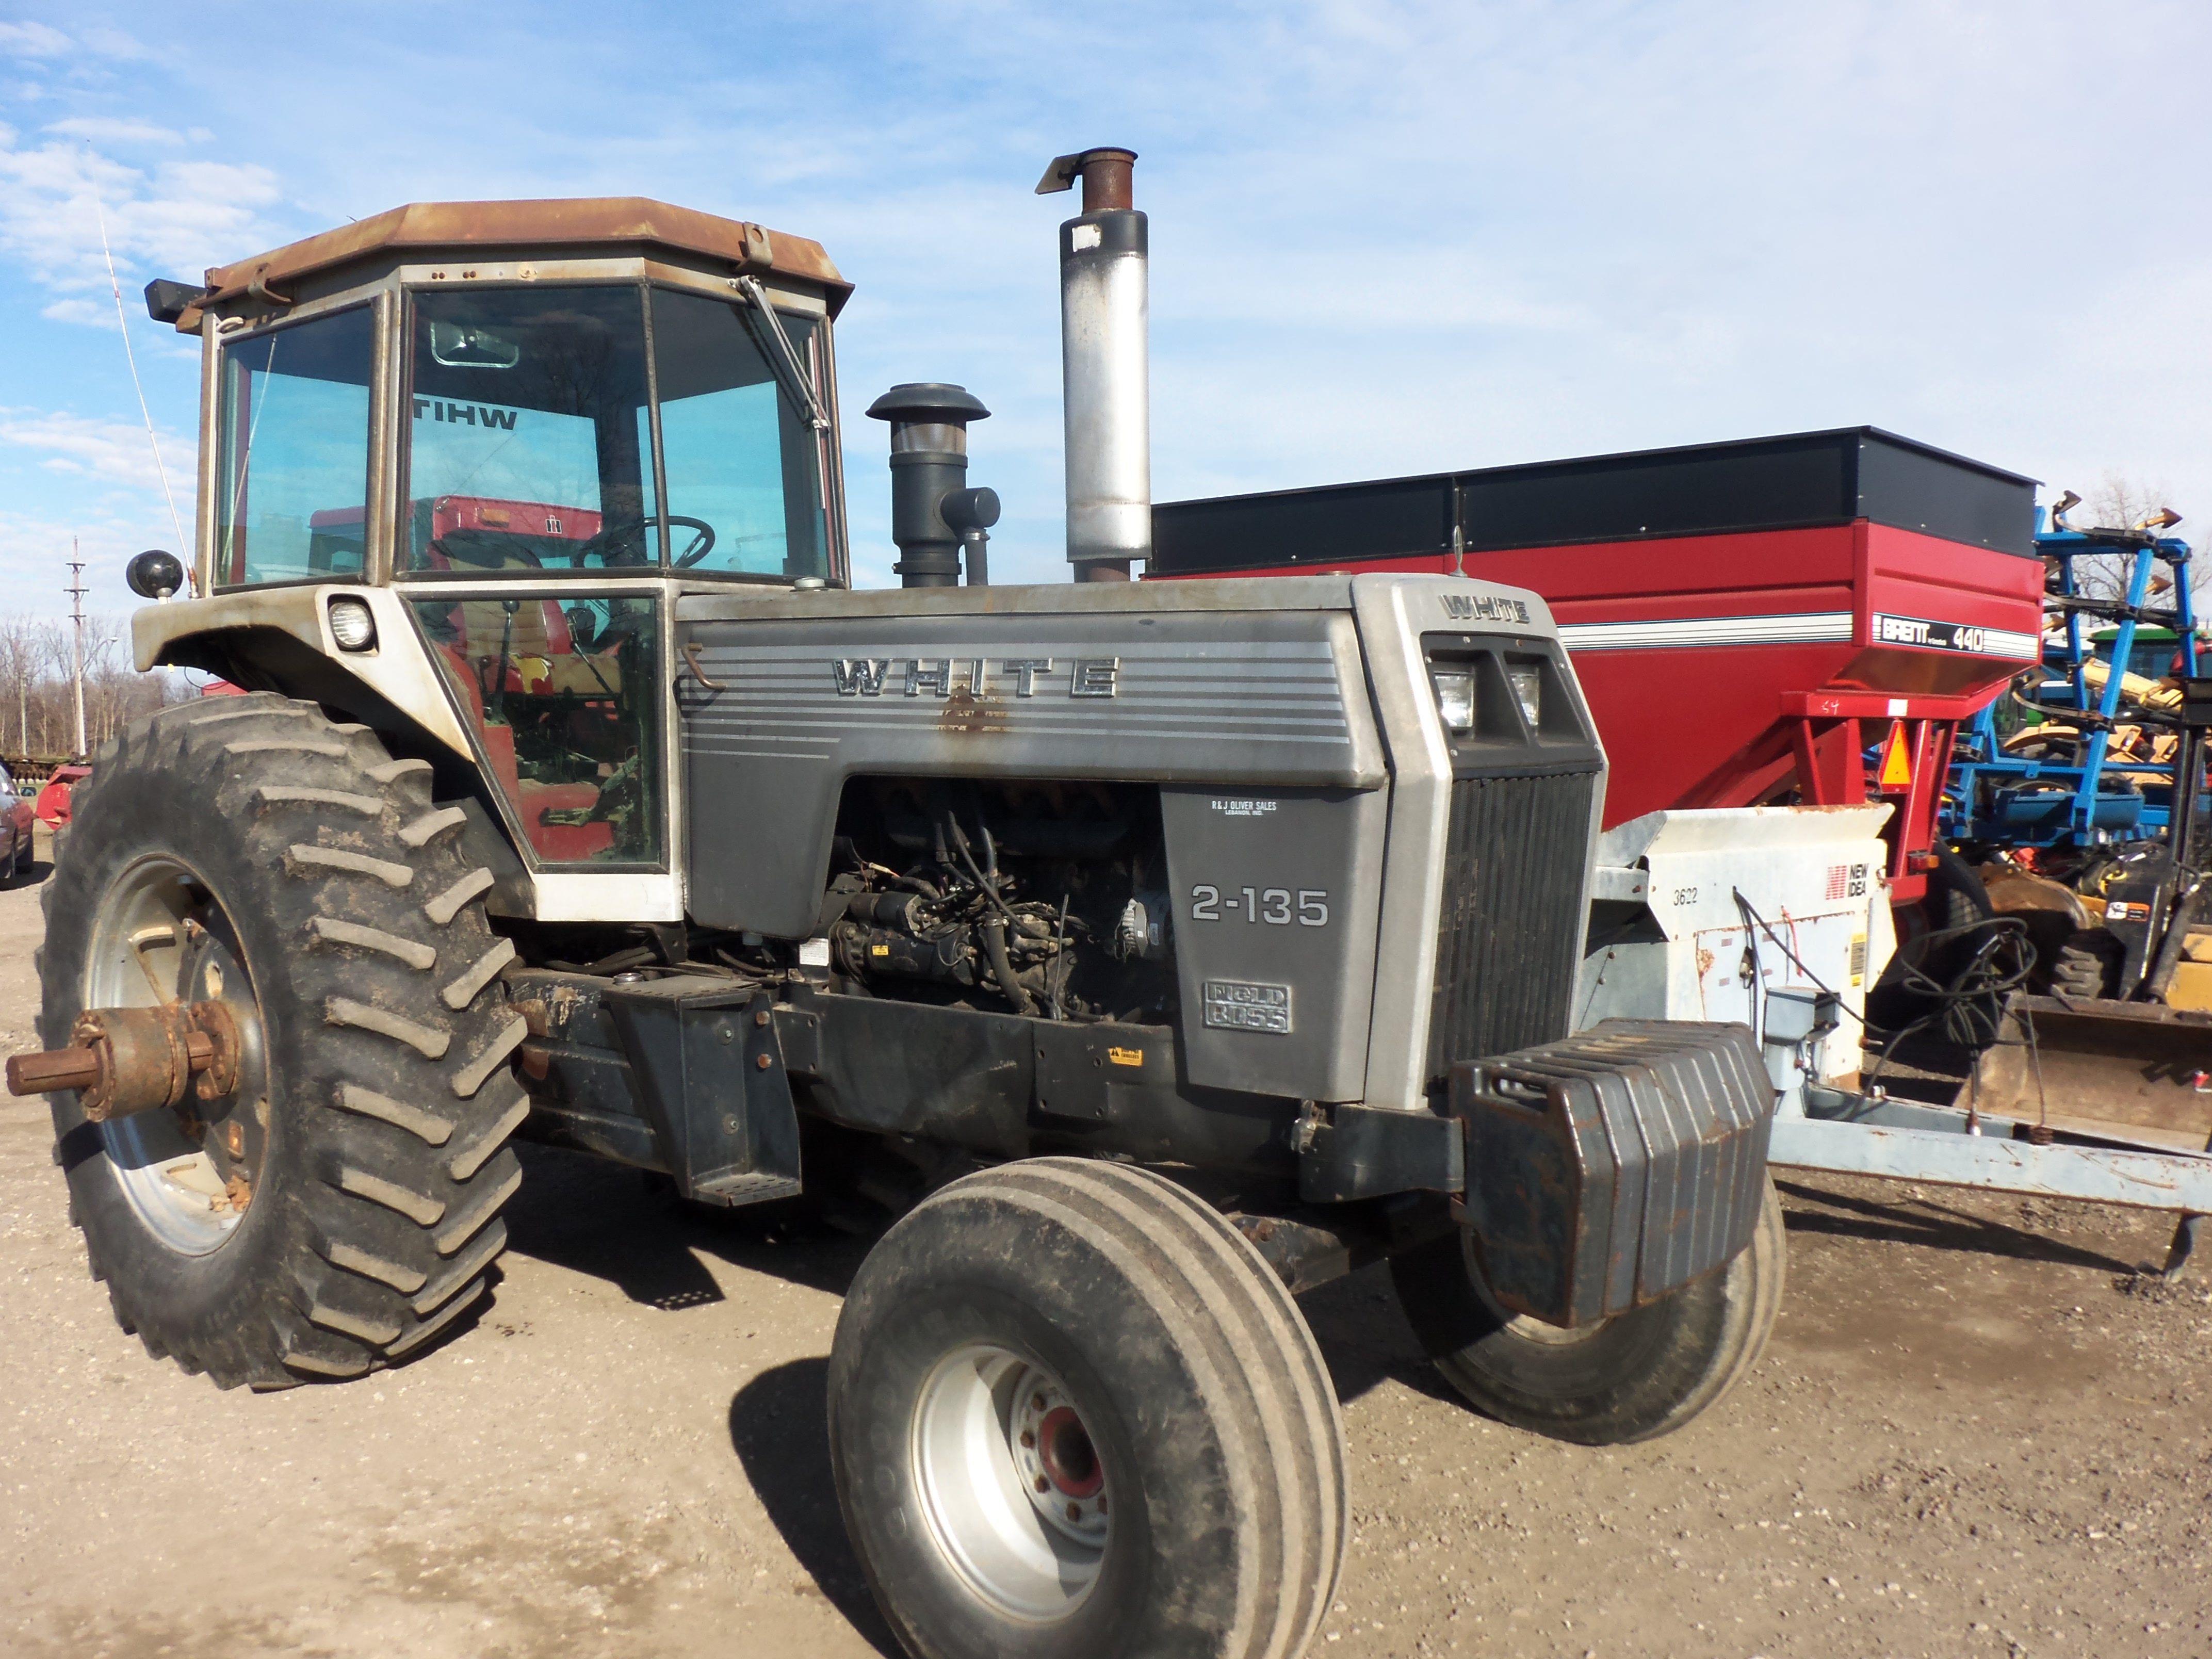 White 2-135 Field Boss tractor